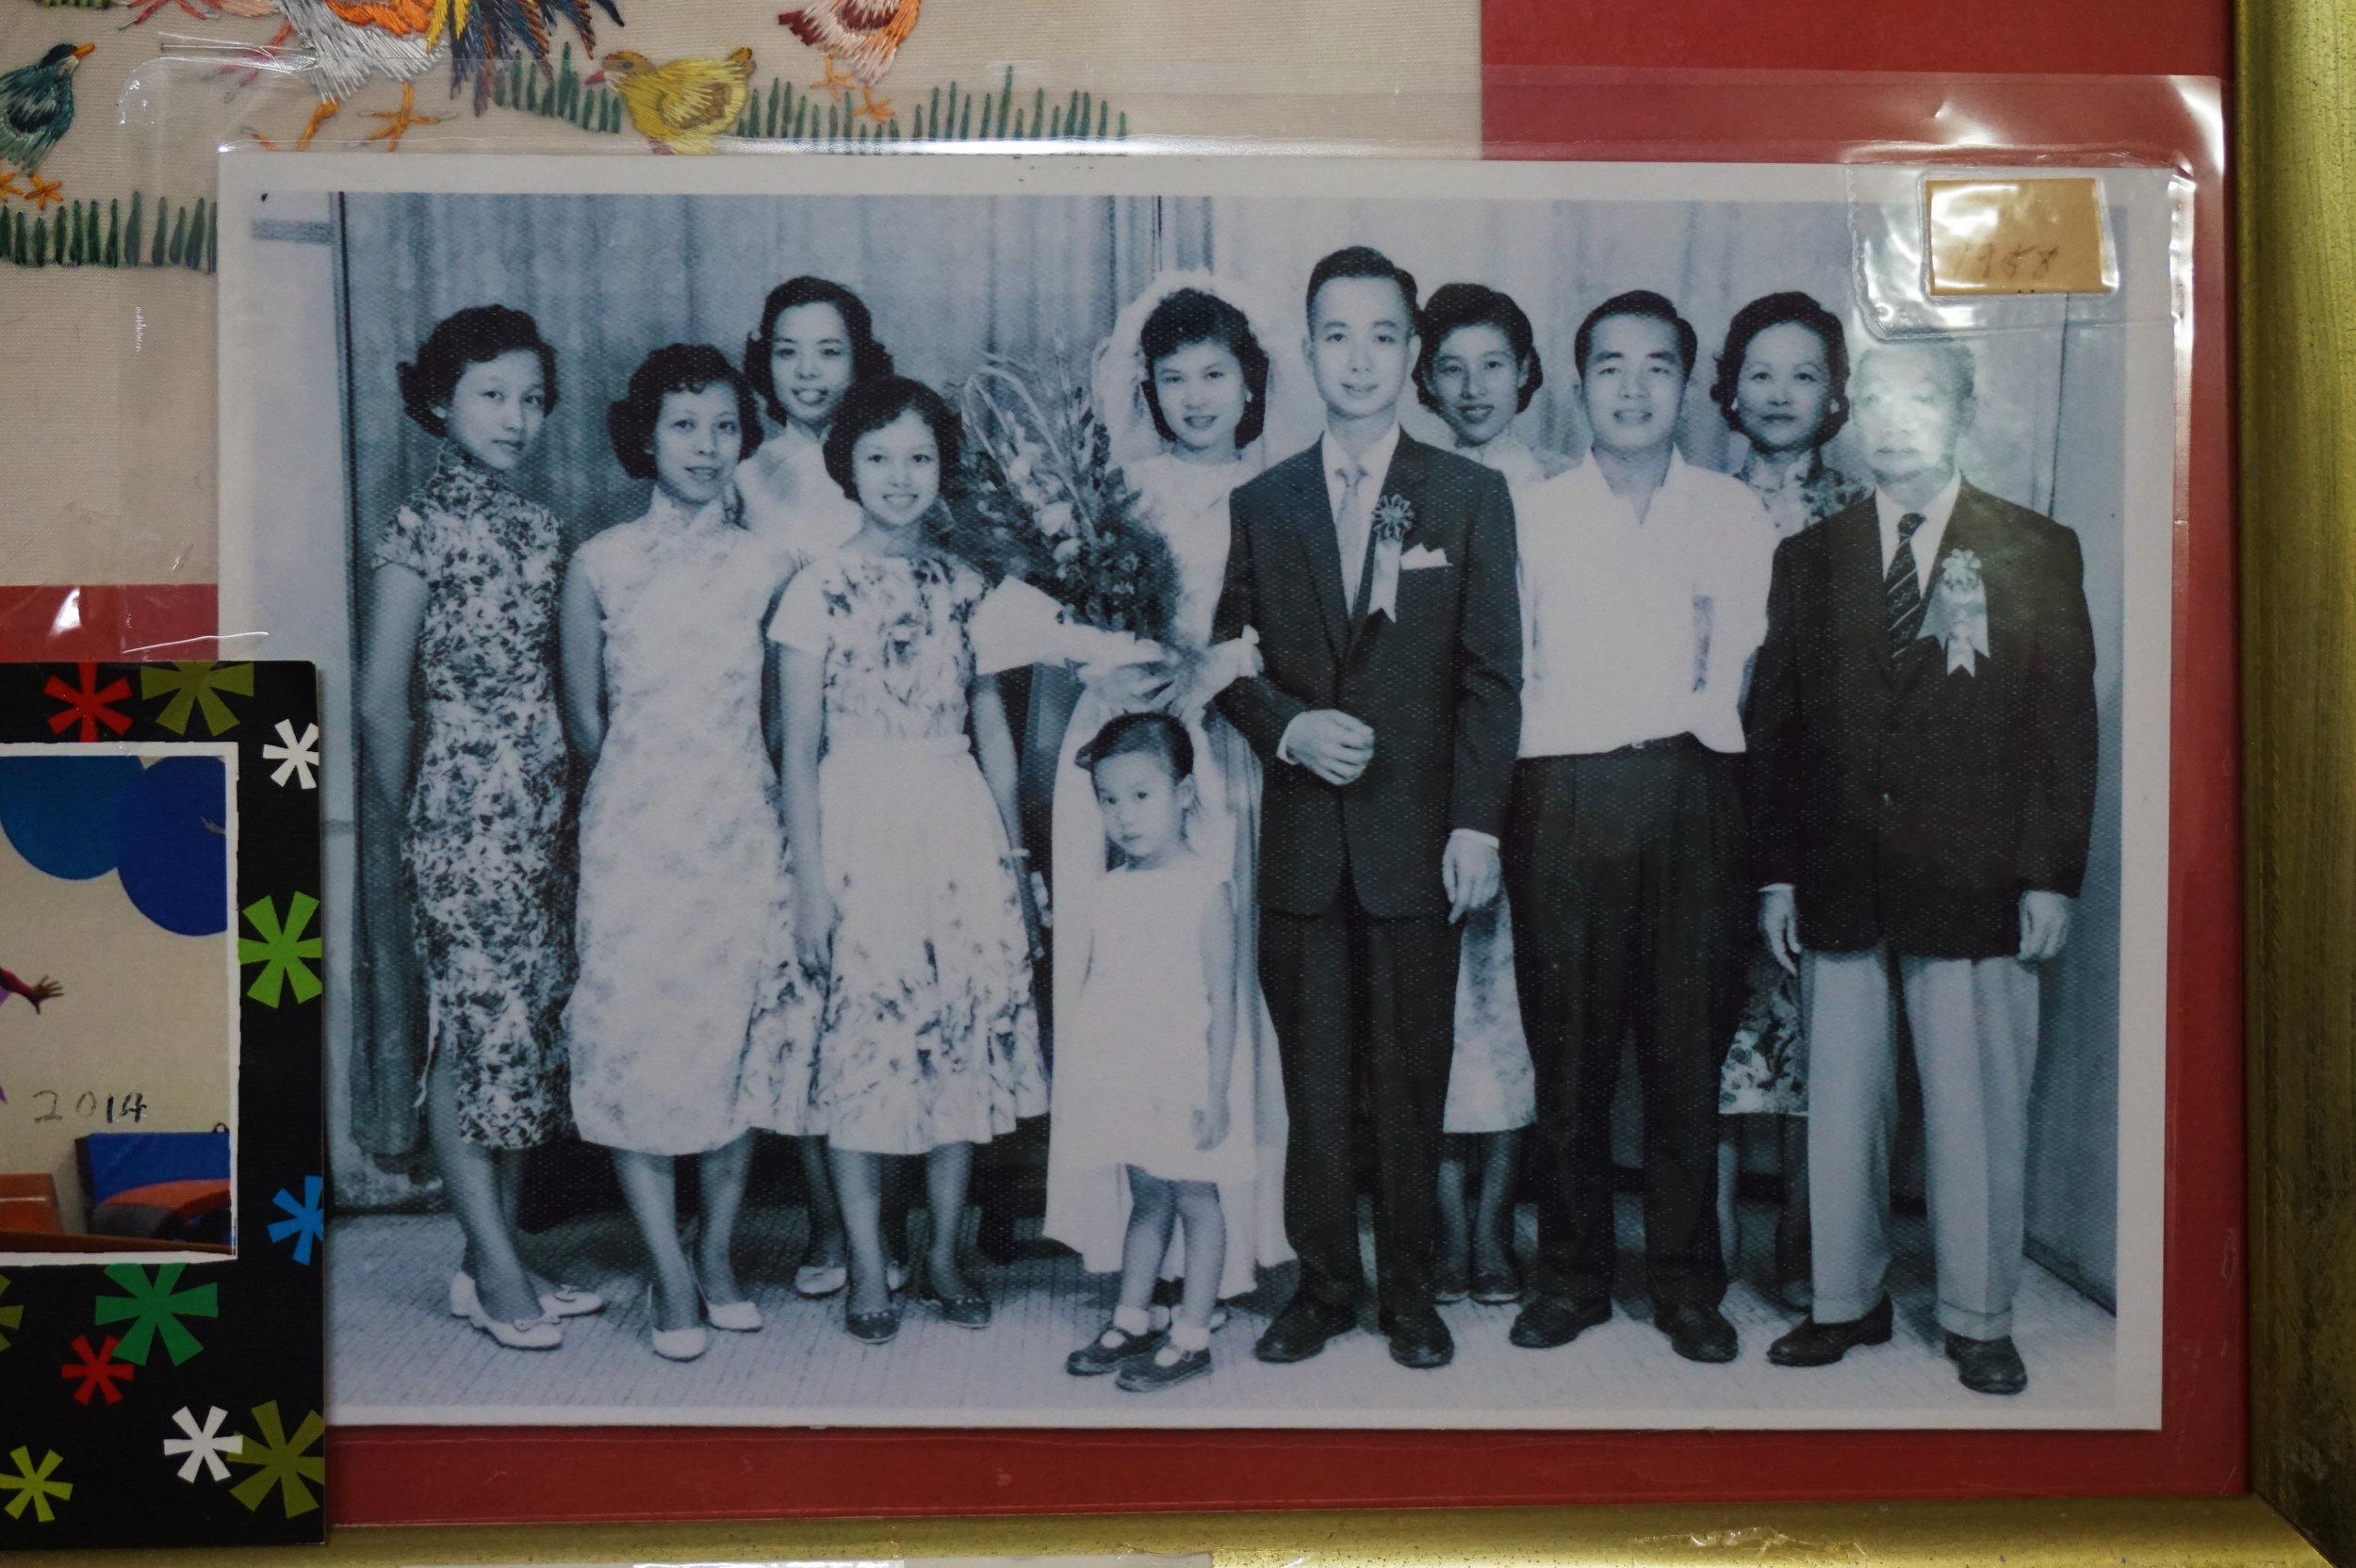 My grandparents' wedding picture